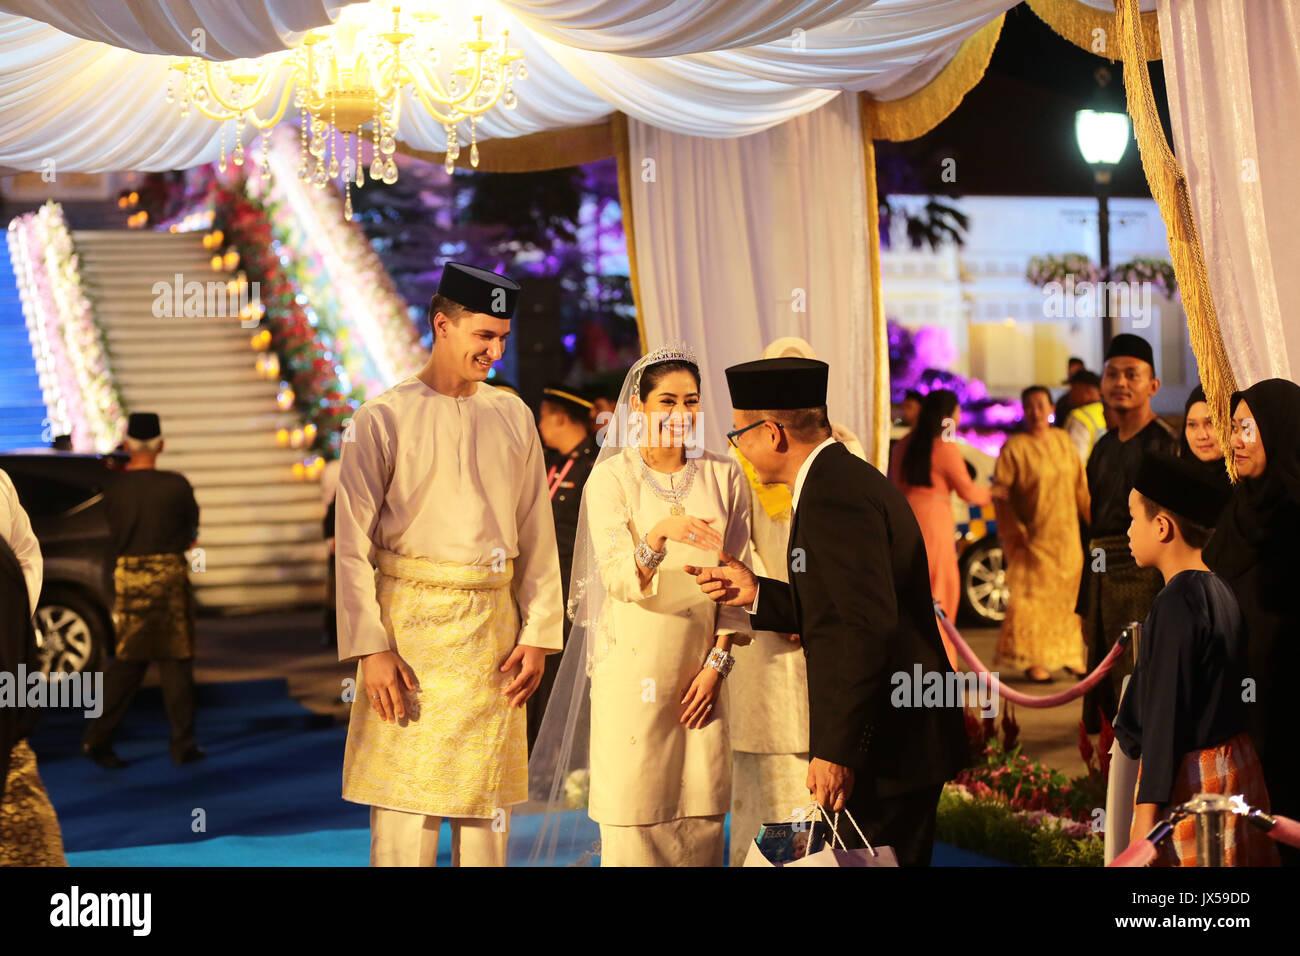 Johor bahru malaysia 14th aug 2017 handout marriage of johor bahru malaysia 14th aug 2017 handout marriage of princess tunku tun aminah sultan ibrahimjewelery and dutch born dennis muhammad abdullah junglespirit Choice Image